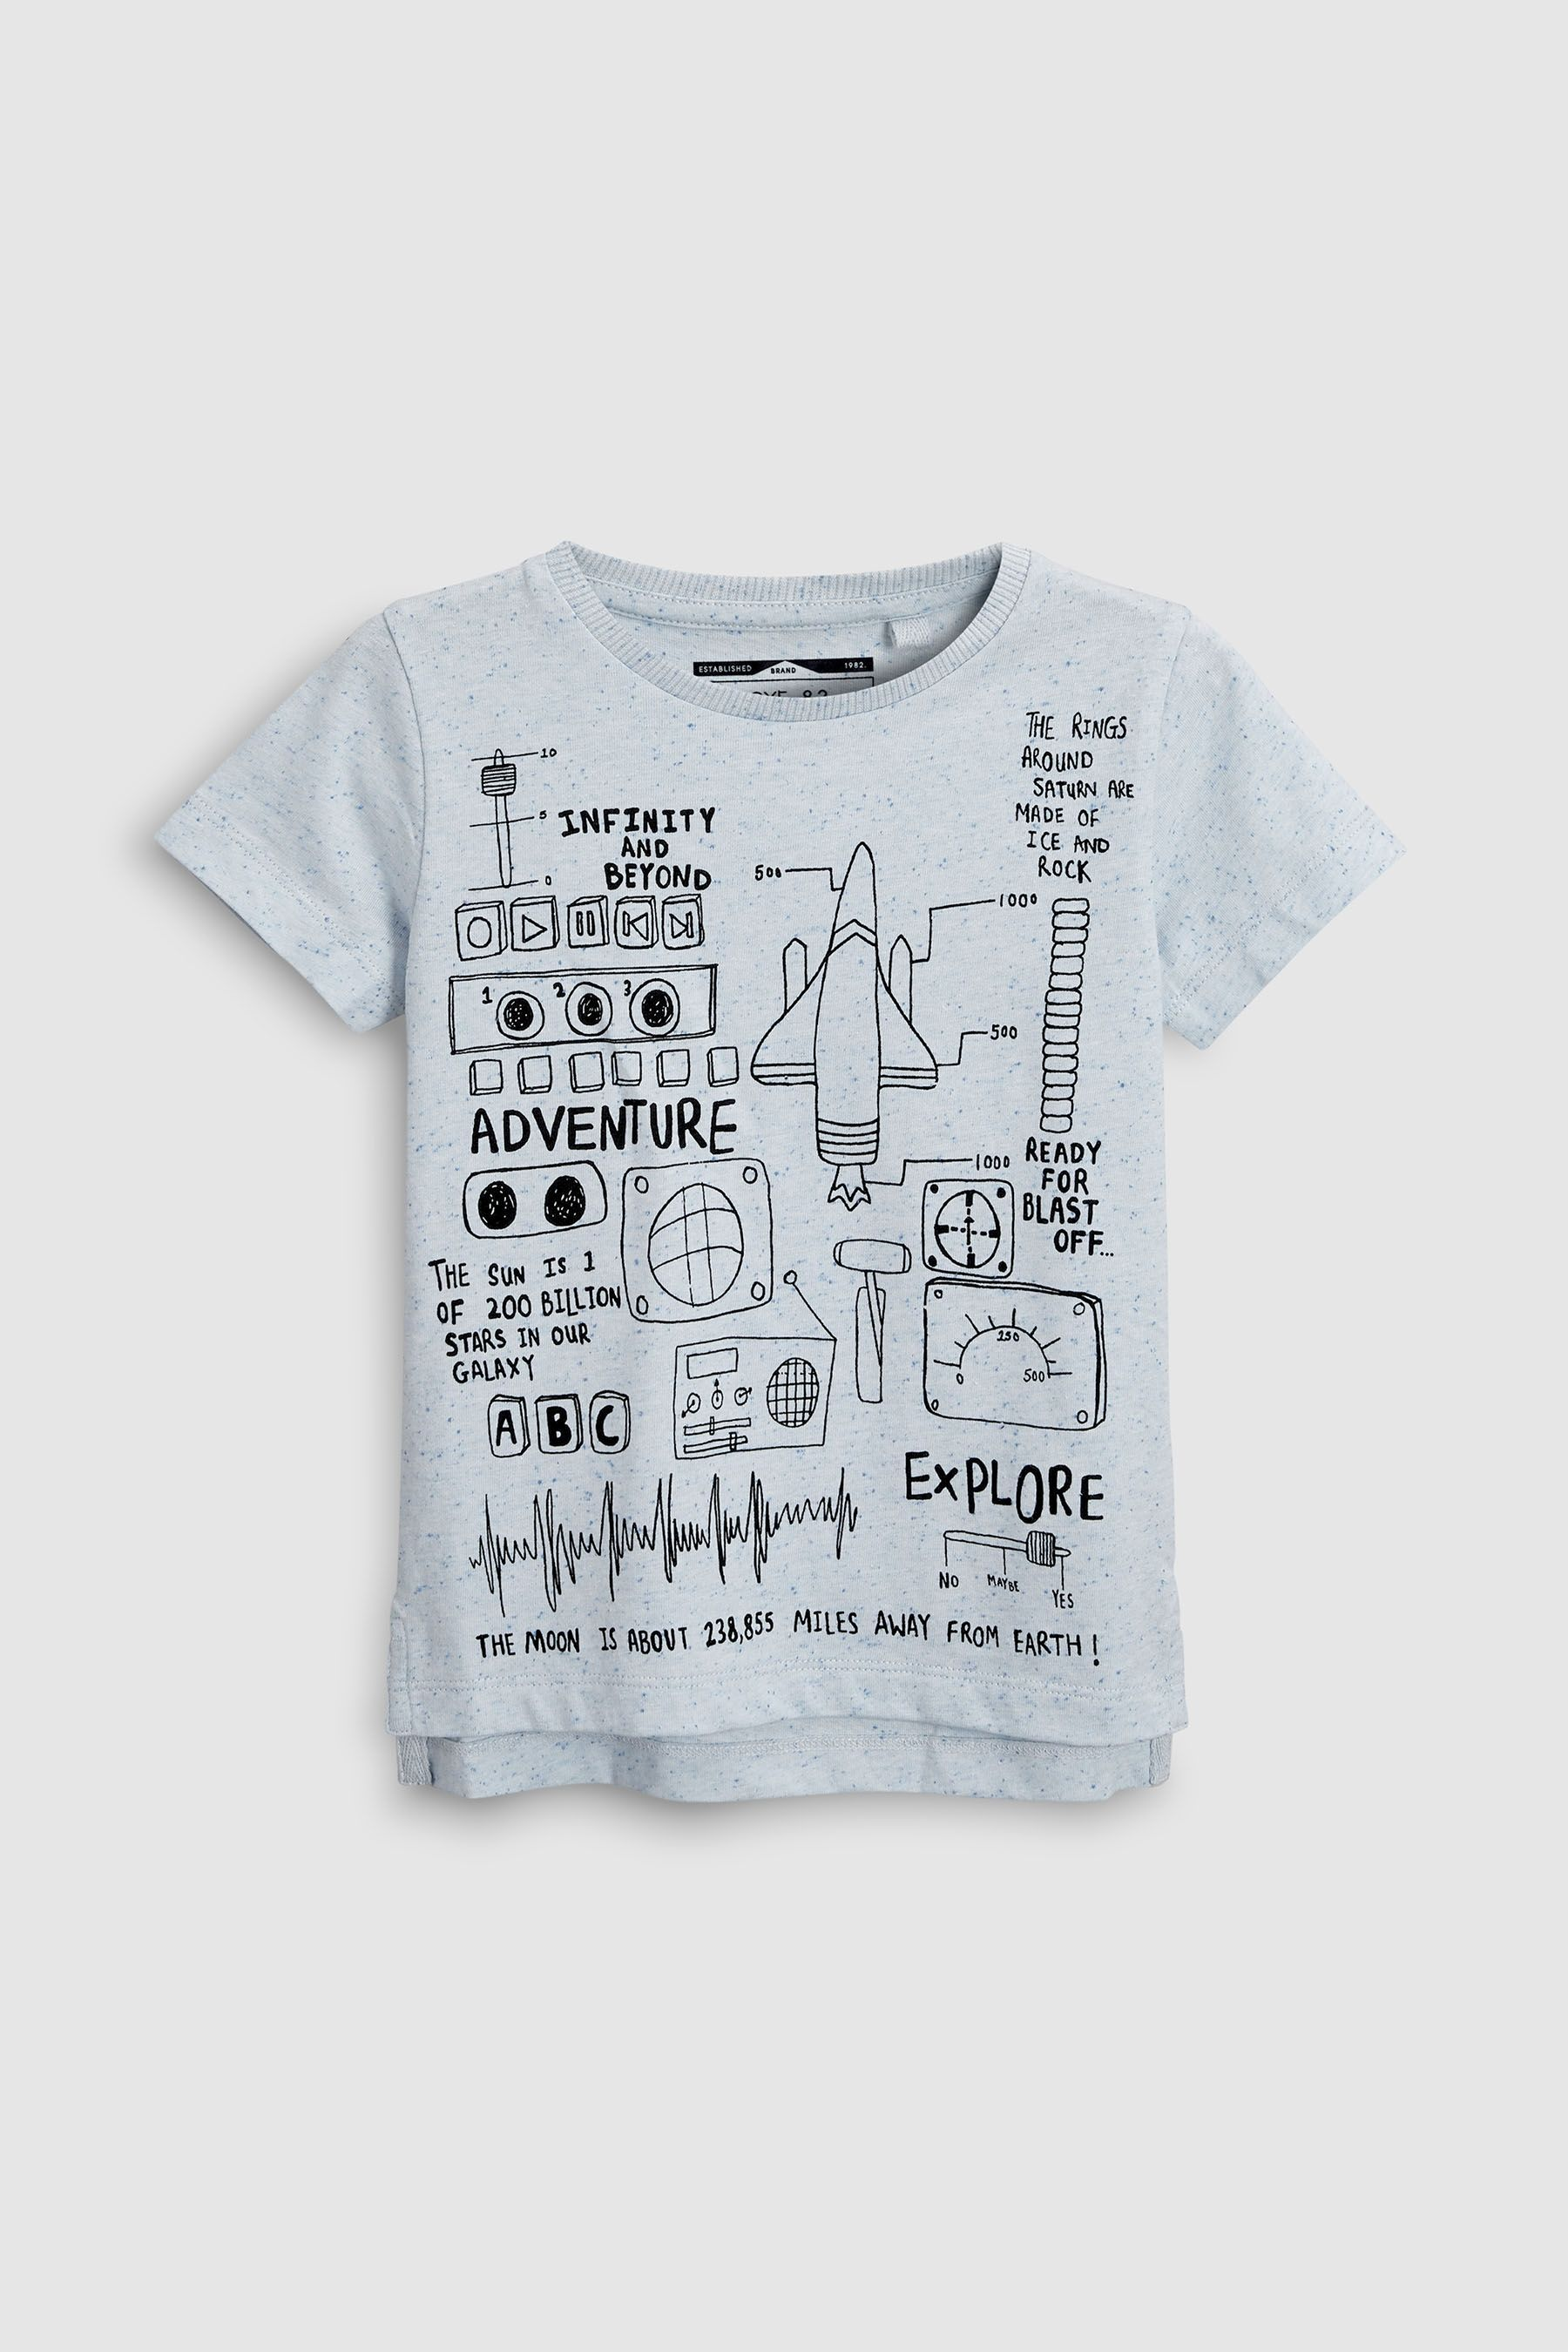 d803a871 Graphic T Shirts Jcpenney   Kuenzi Turf & Nursery